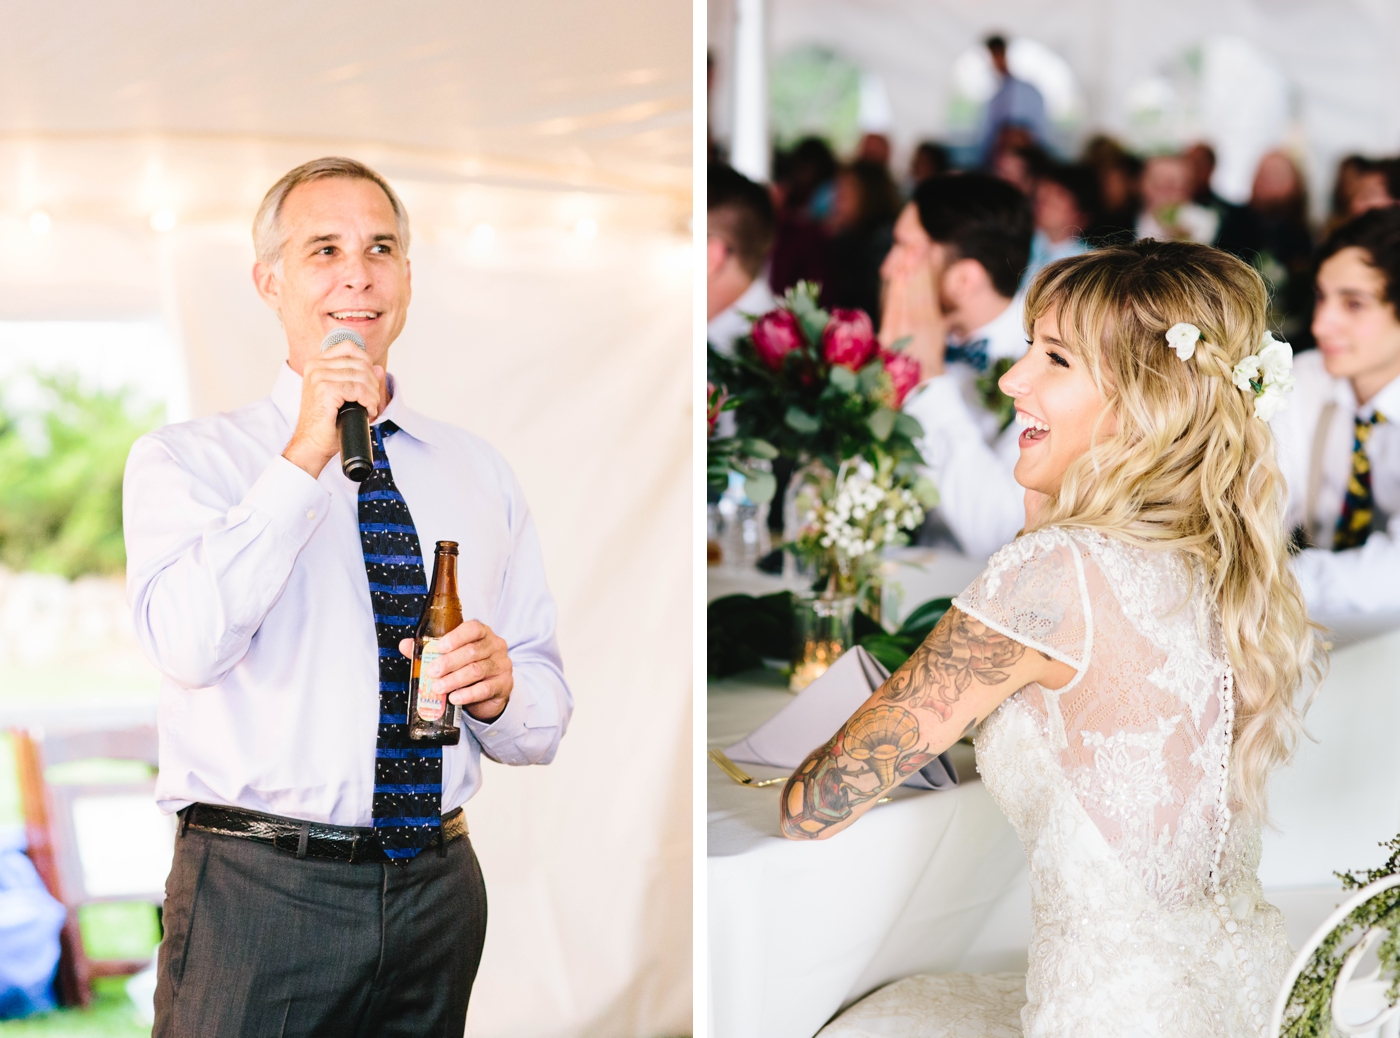 chicago-fine-art-wedding-photography-chriskelsey42